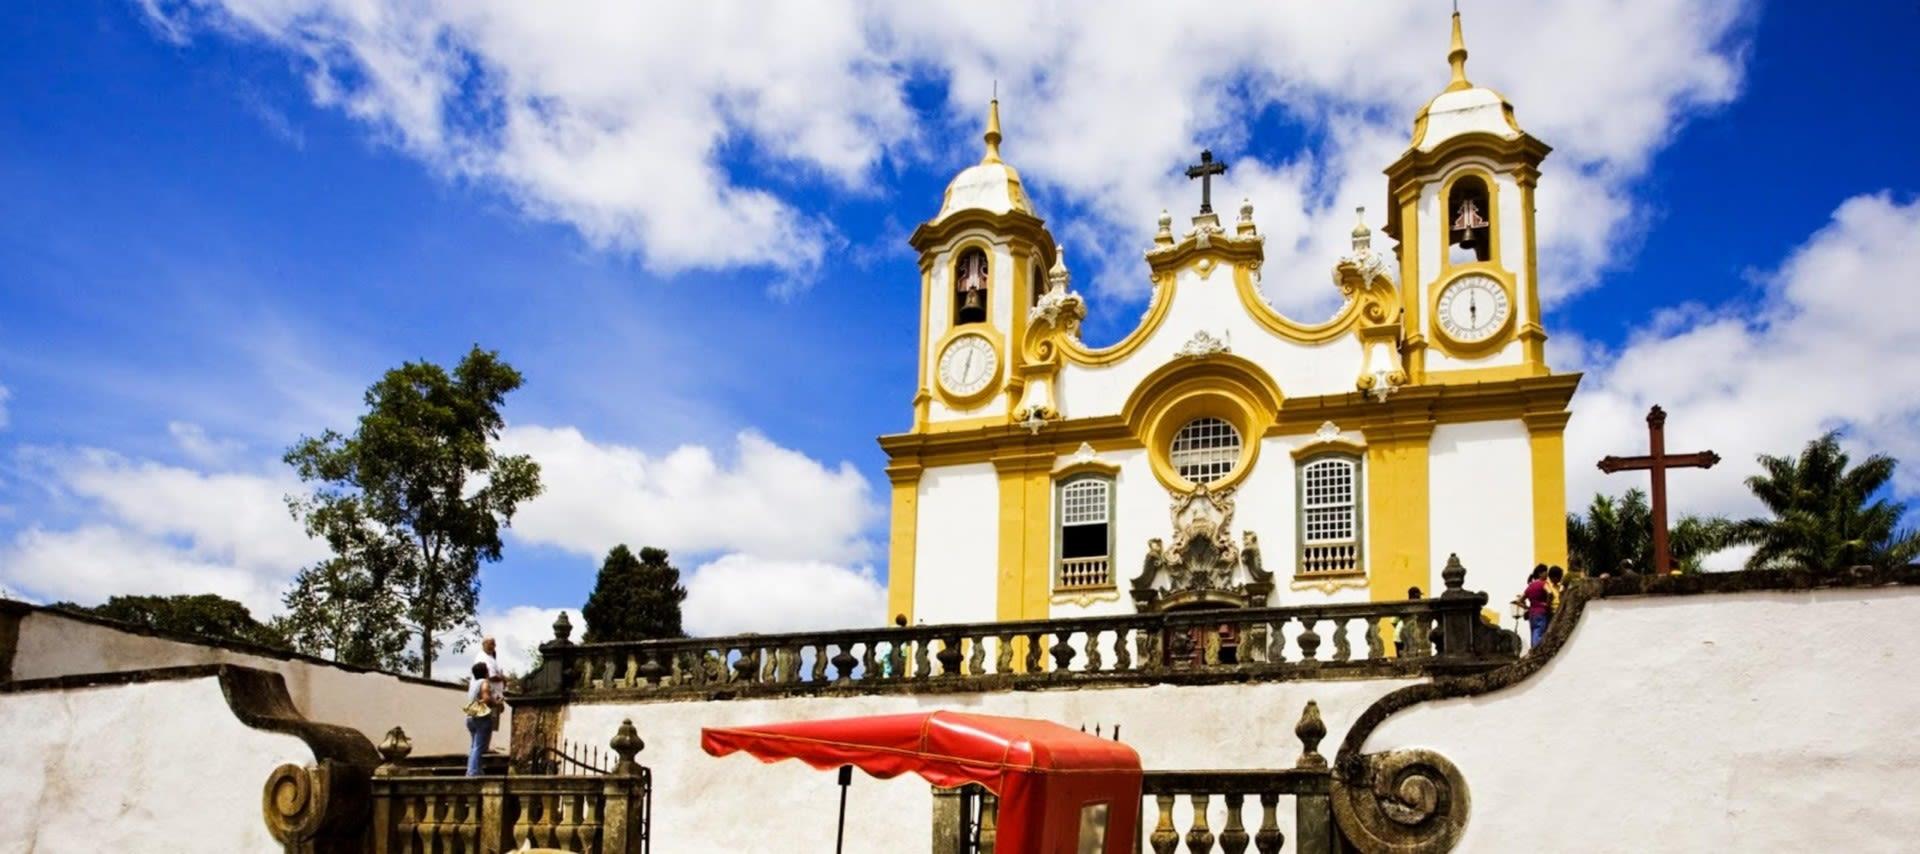 Large church in Brazil